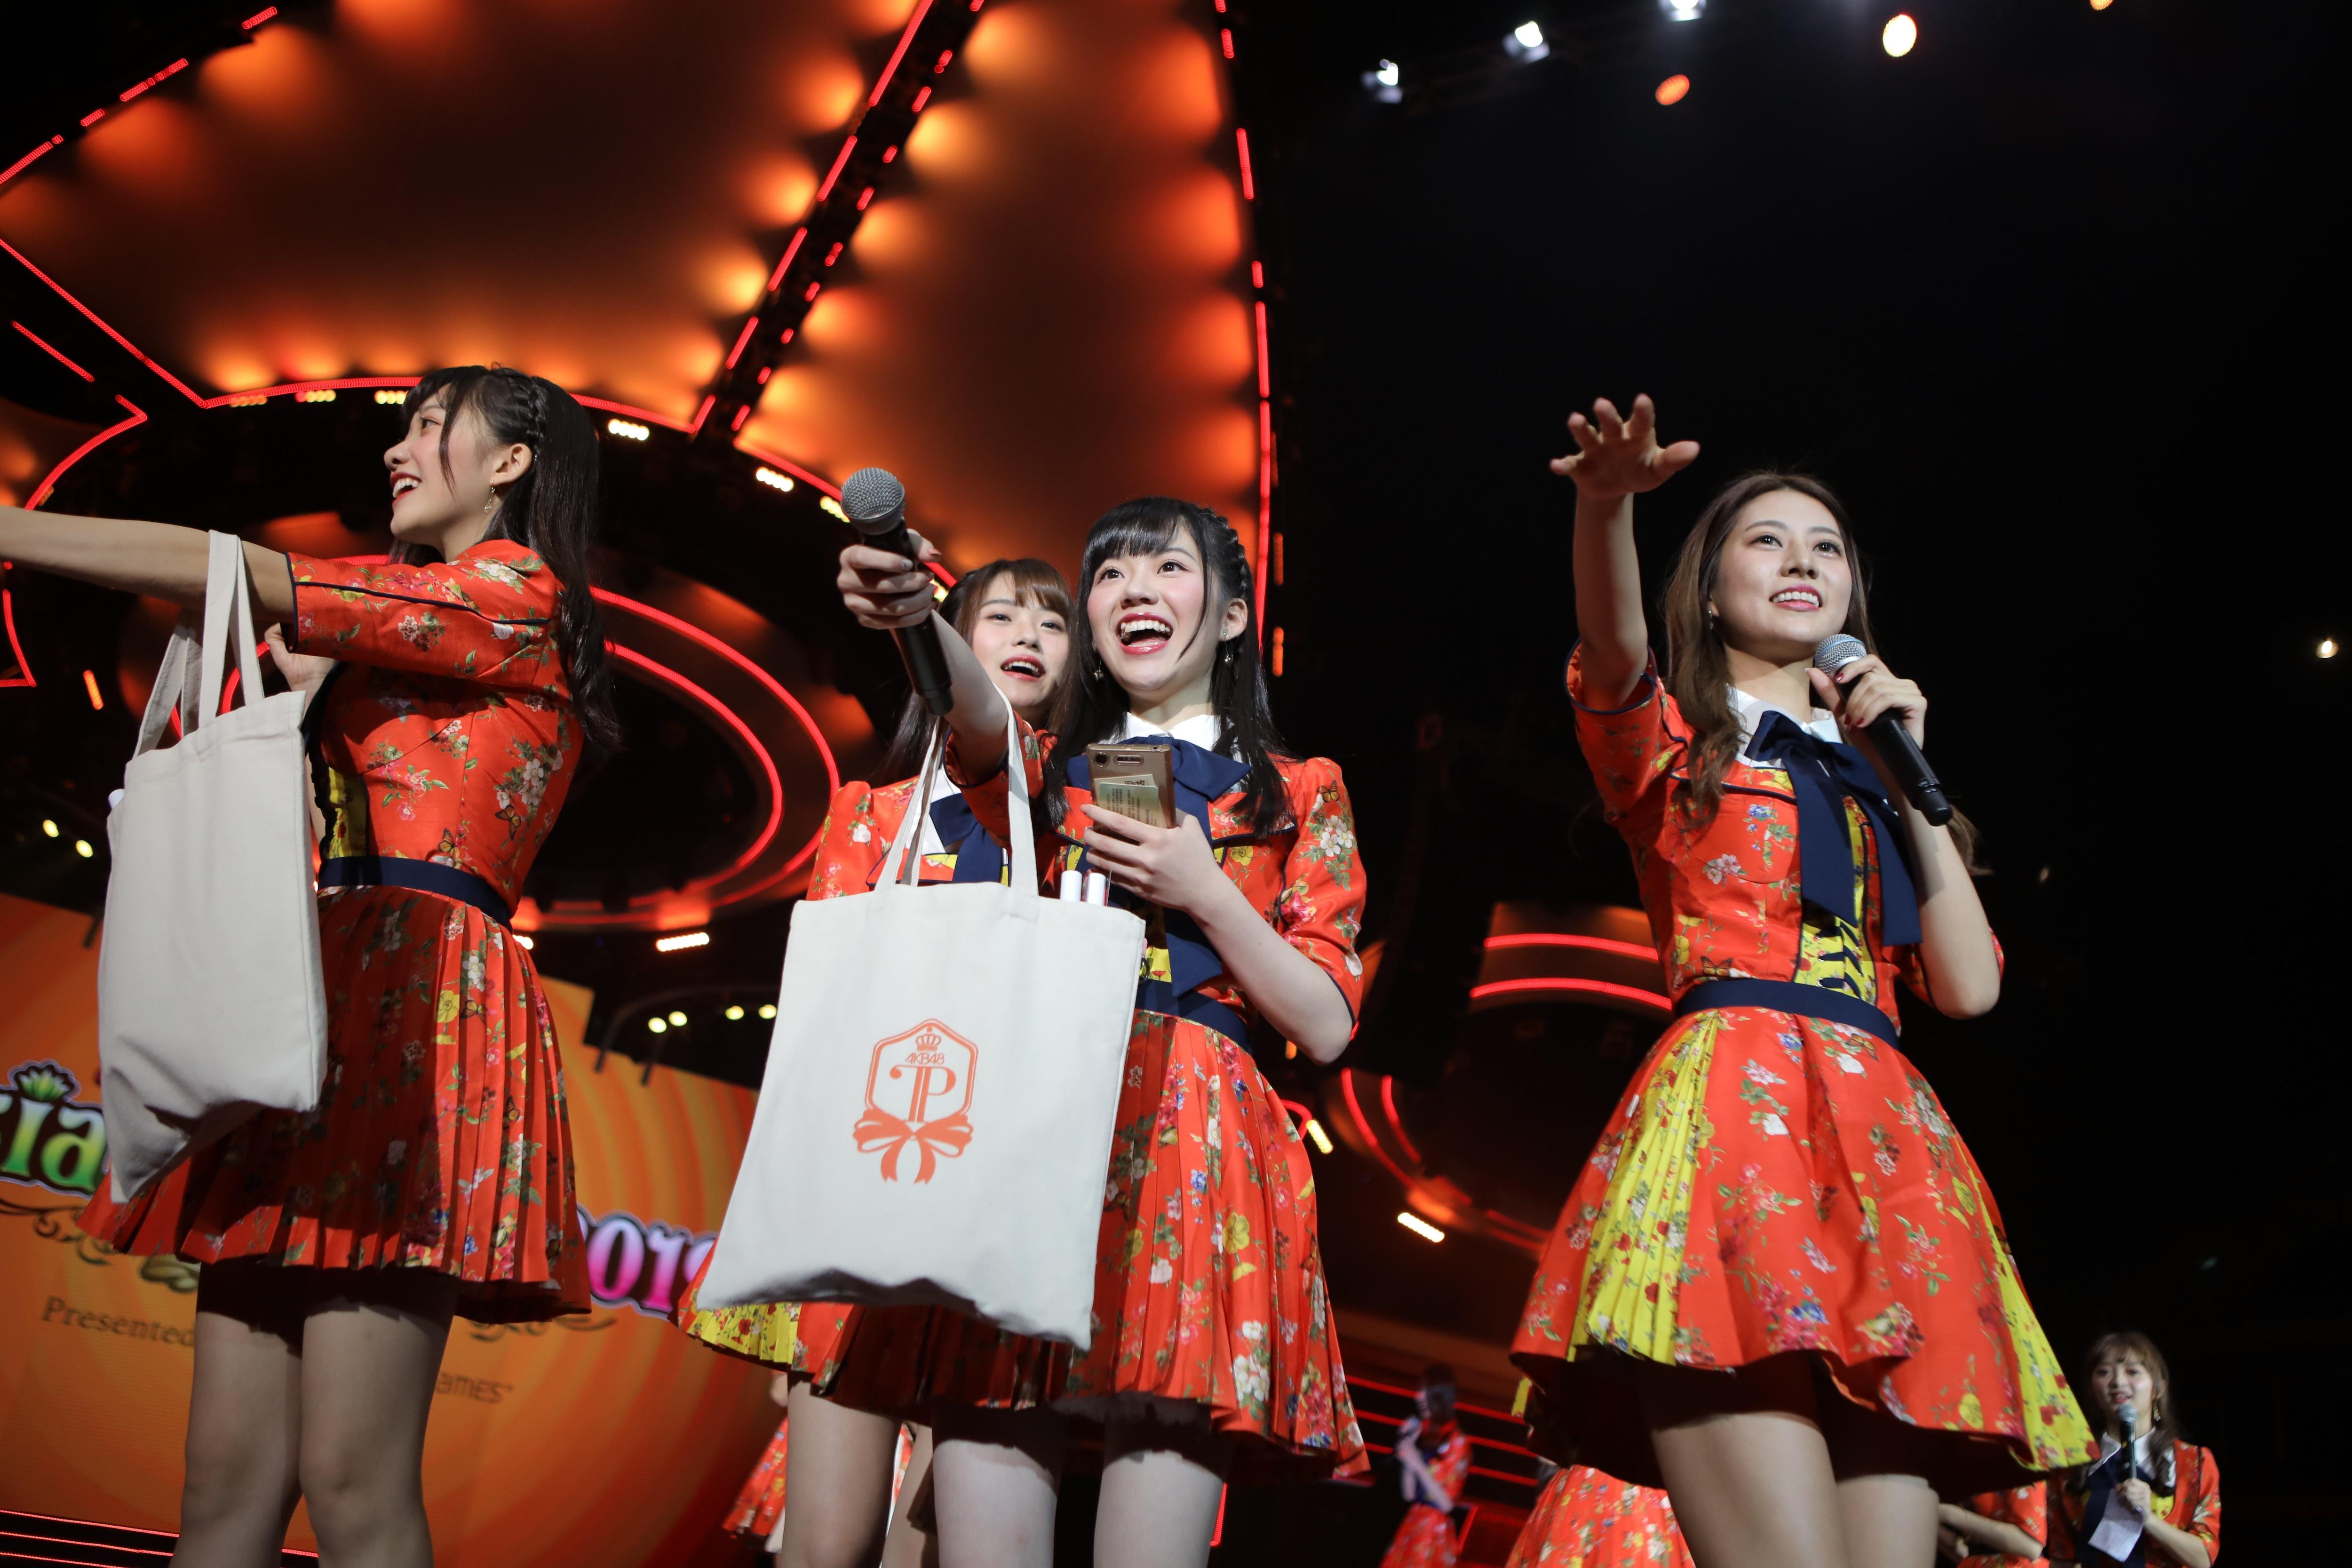 AKB48ほか、海外の姉妹グループが集結し『恋するフォーチュンクッキー』を熱唱!【写真23枚】の画像023